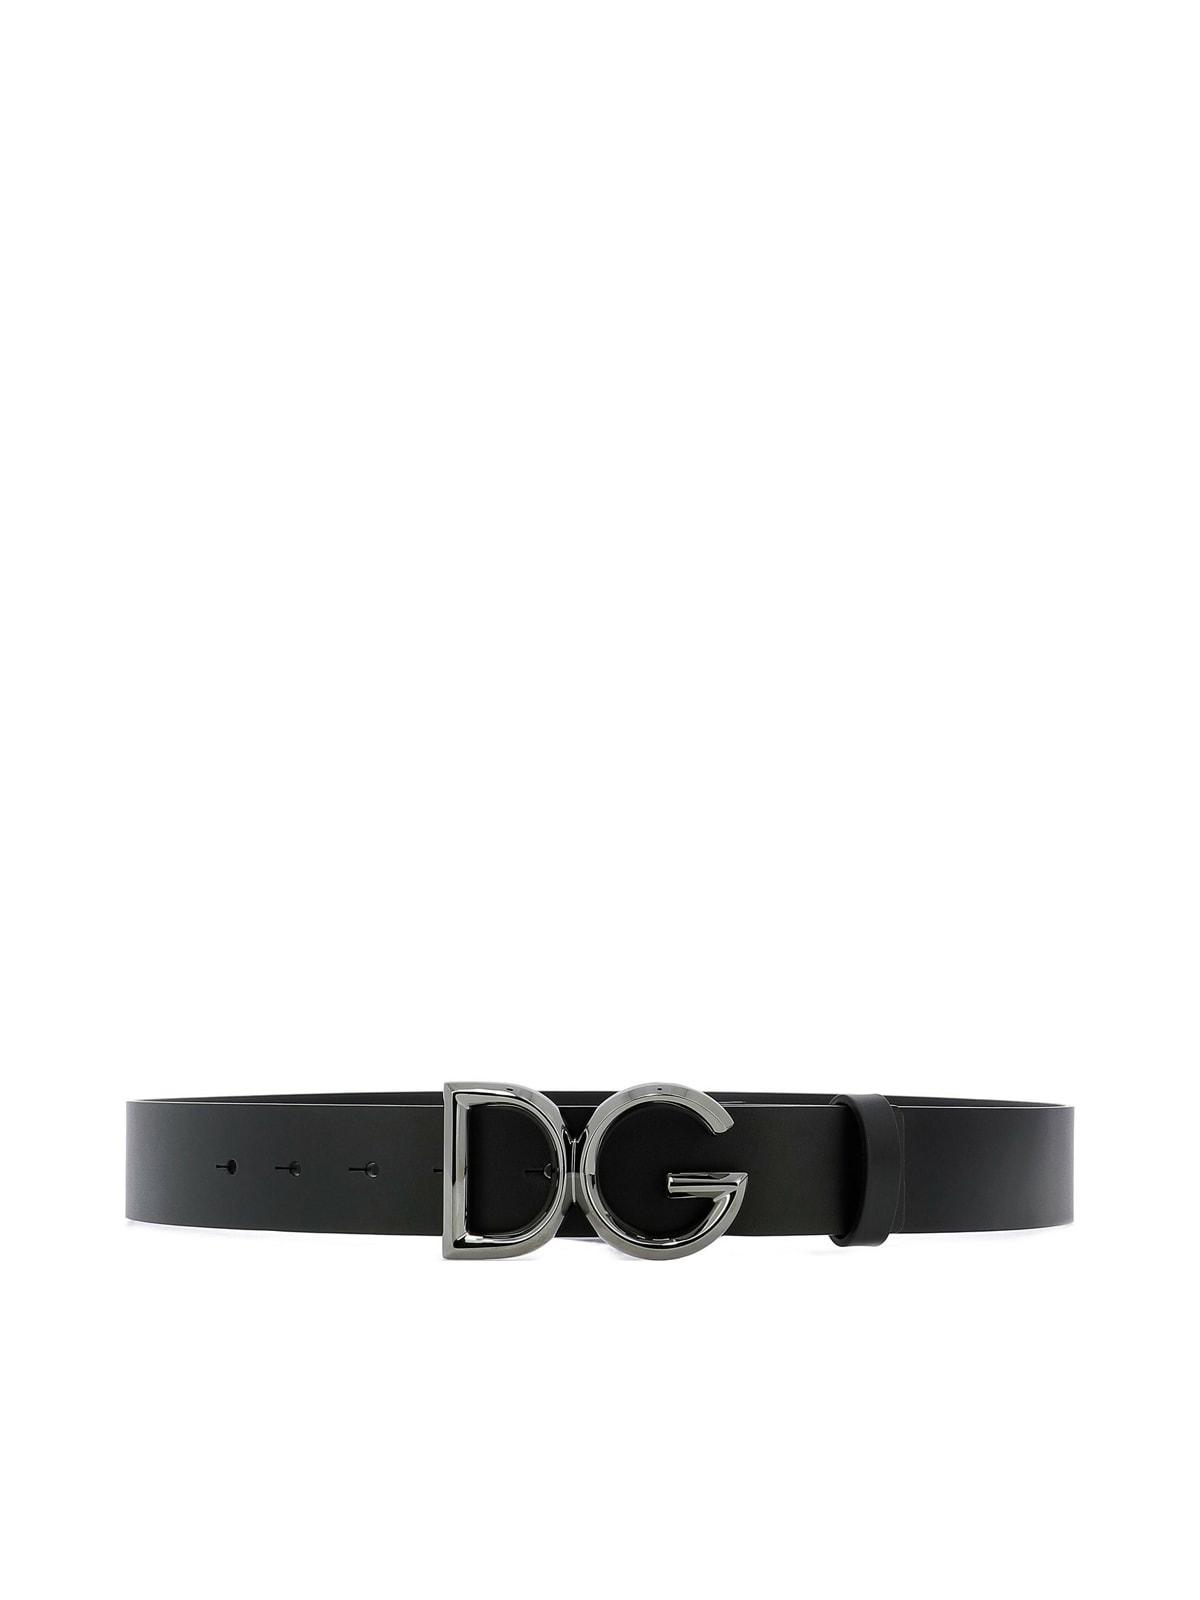 Dolce & Gabbana Belts VINTAGE CUIR LUX BELT